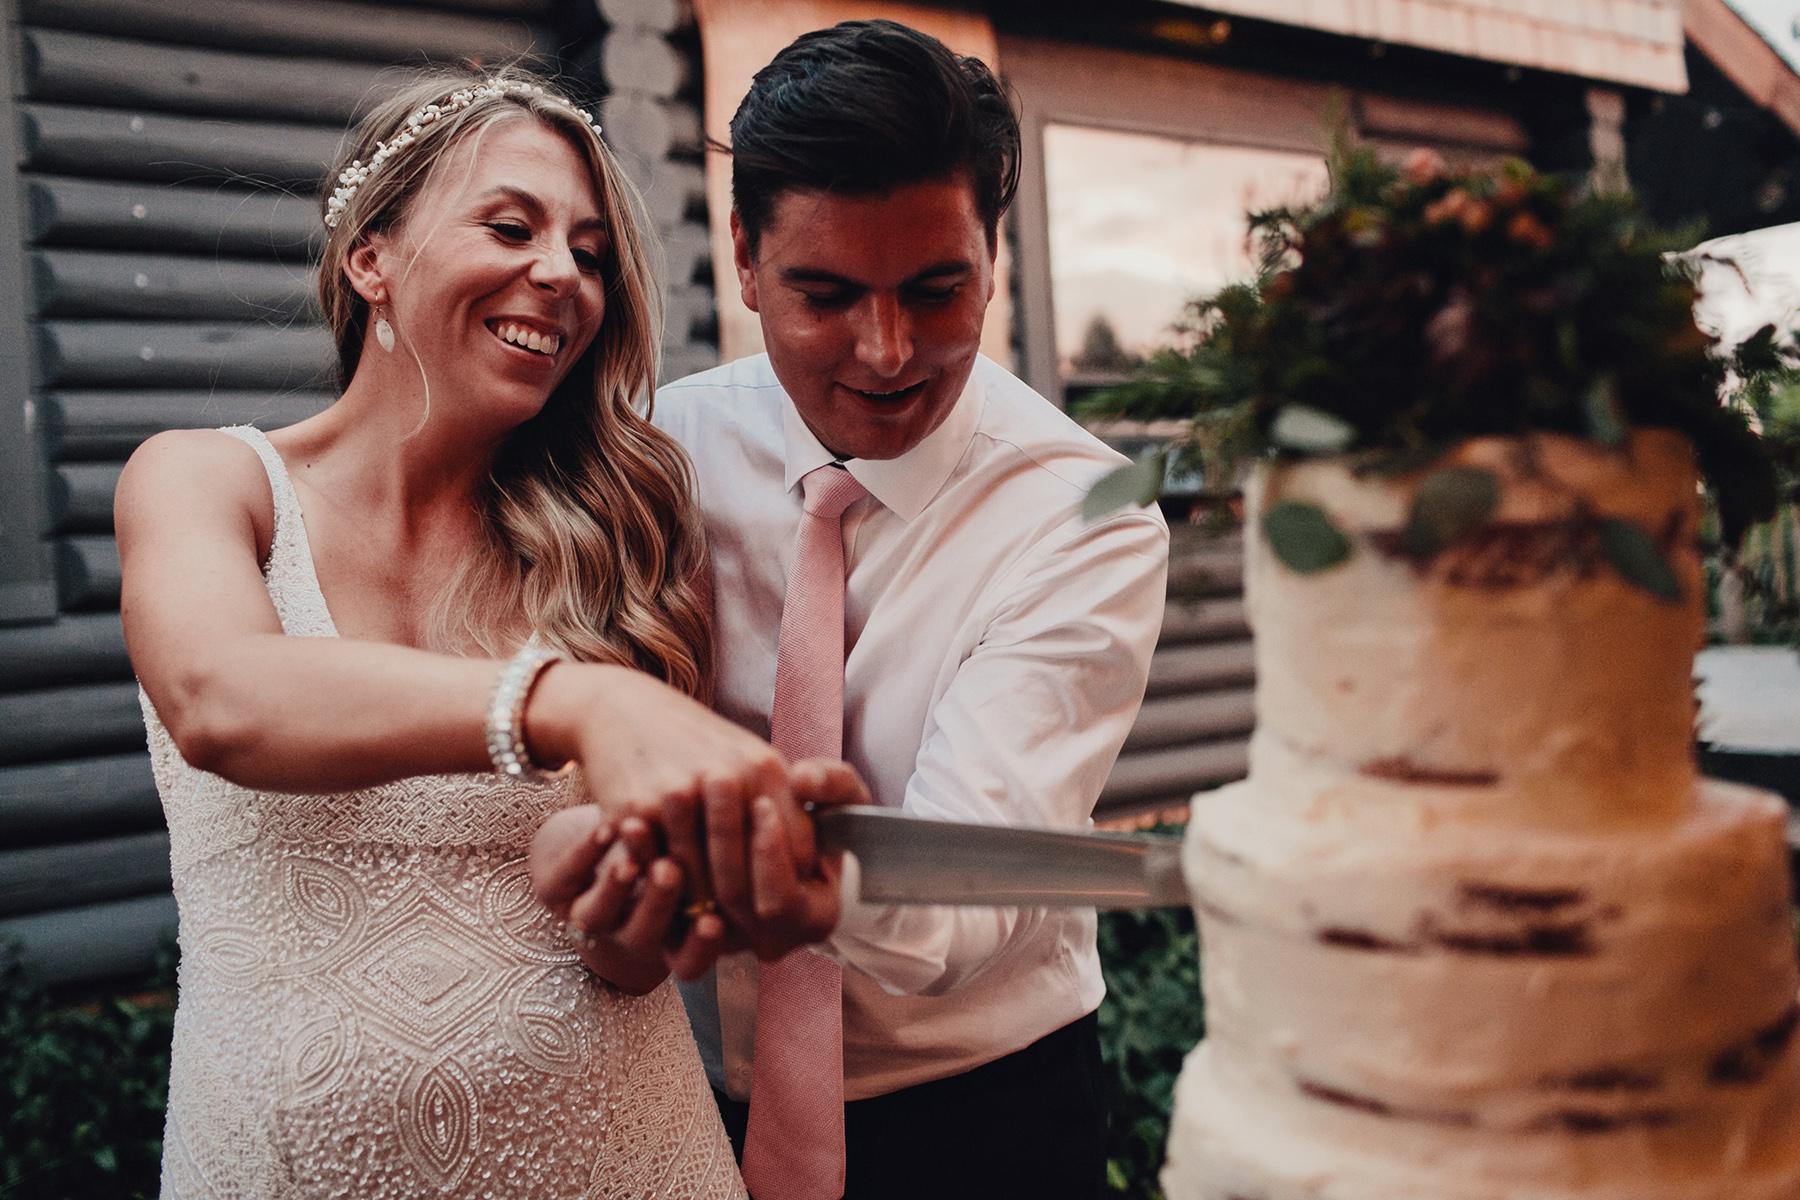 galiano-island-bodega-destination-wedding-0100.JPG